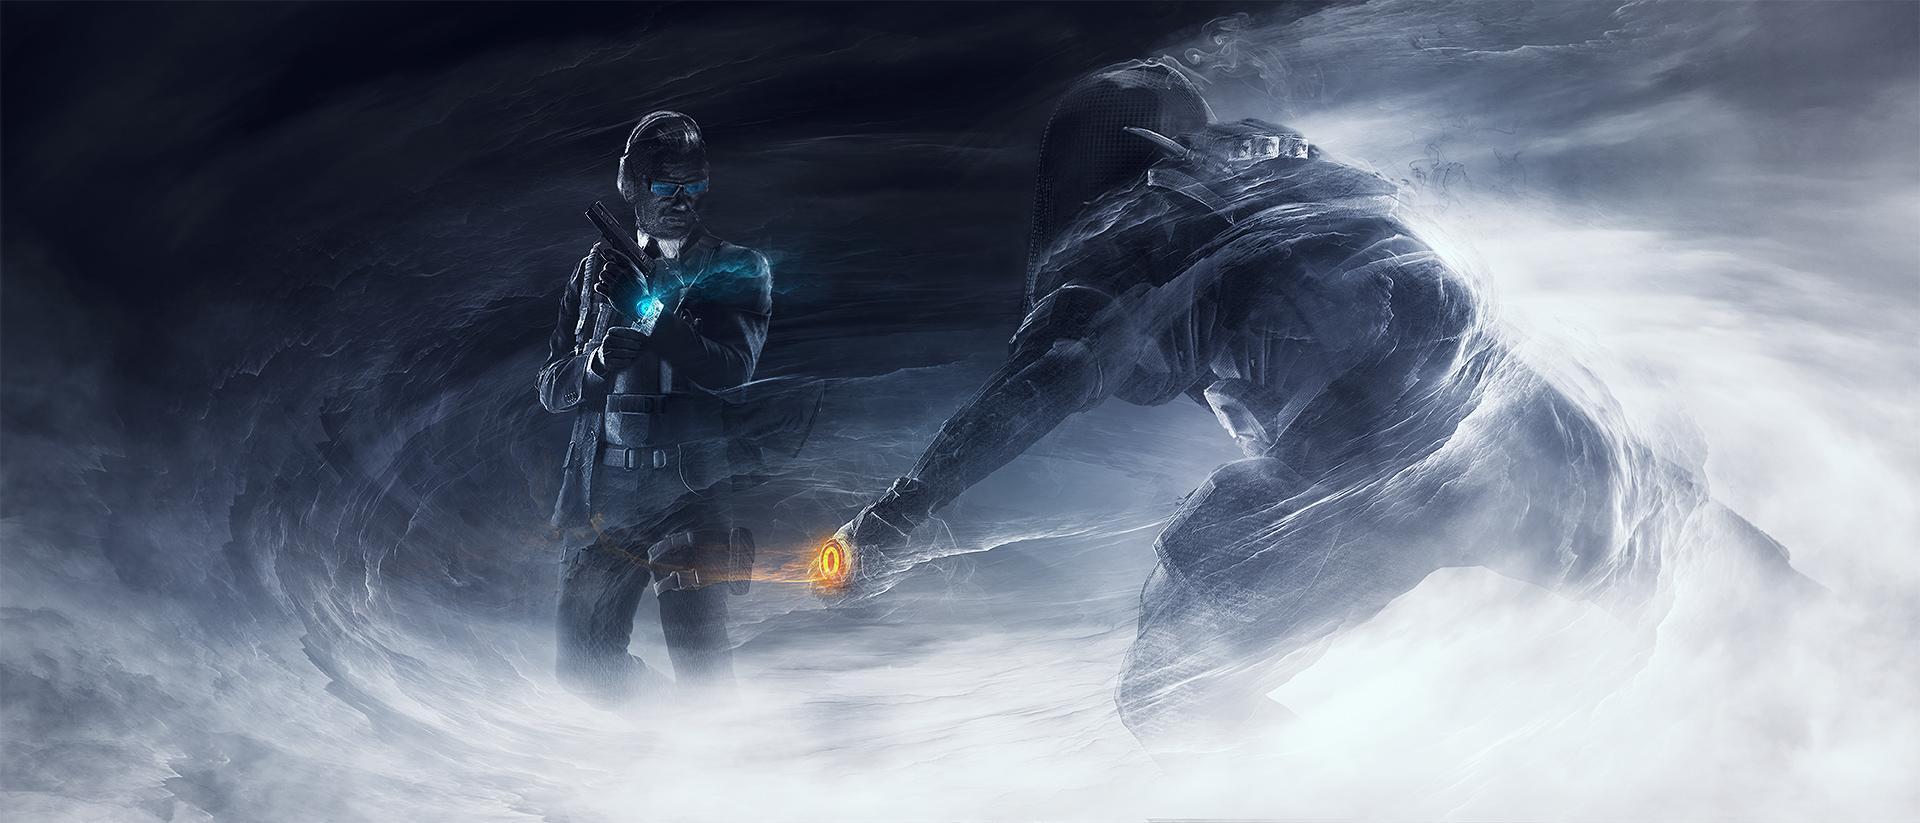 Ubisoft's gamble on Rainbow Six Siege paid off with its esports scene